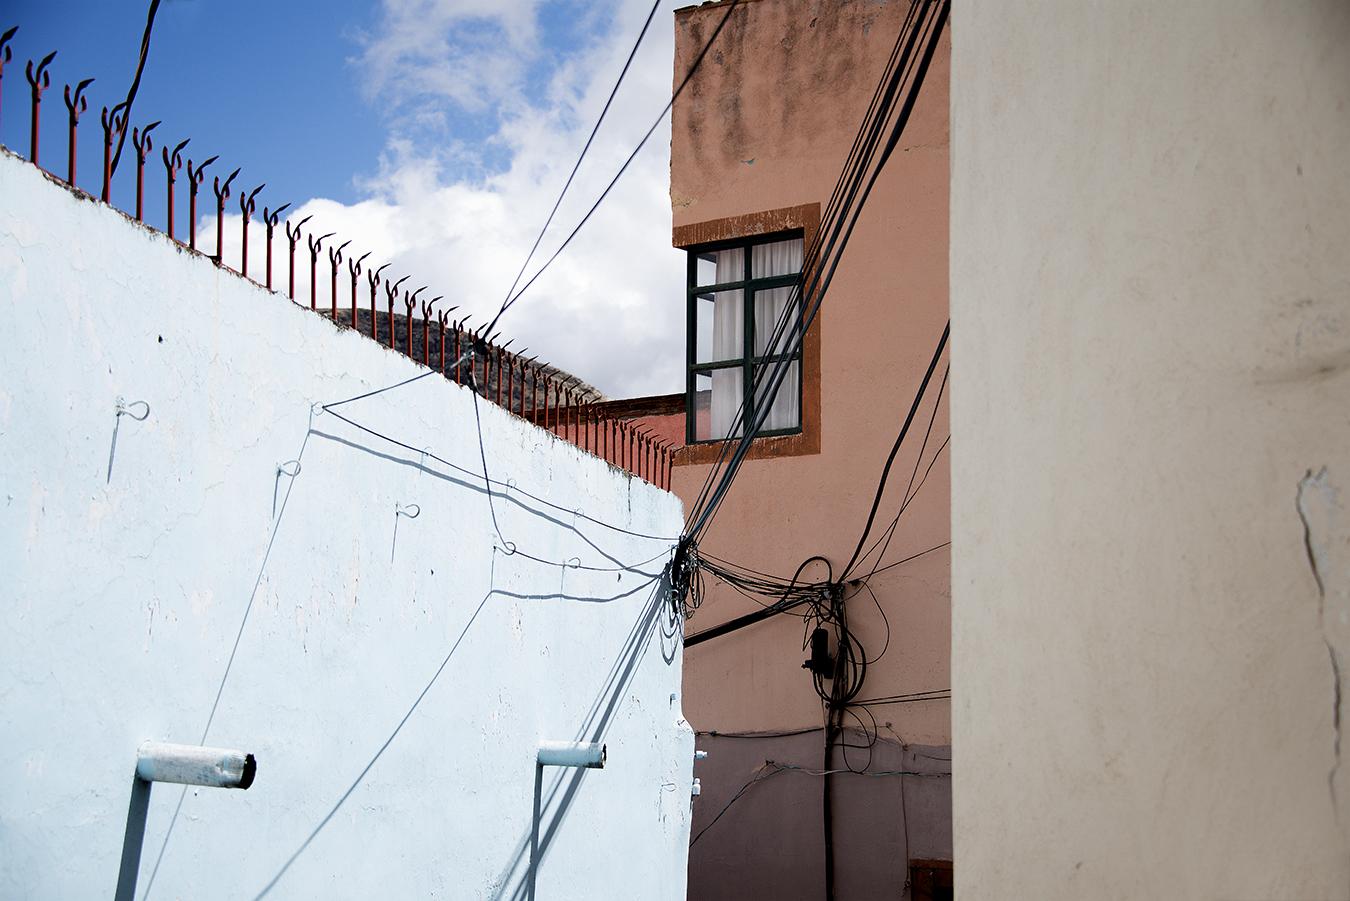 ZoeYunZou_Photography_ShadowsAndColors_Guanajuato_Mexico_2016